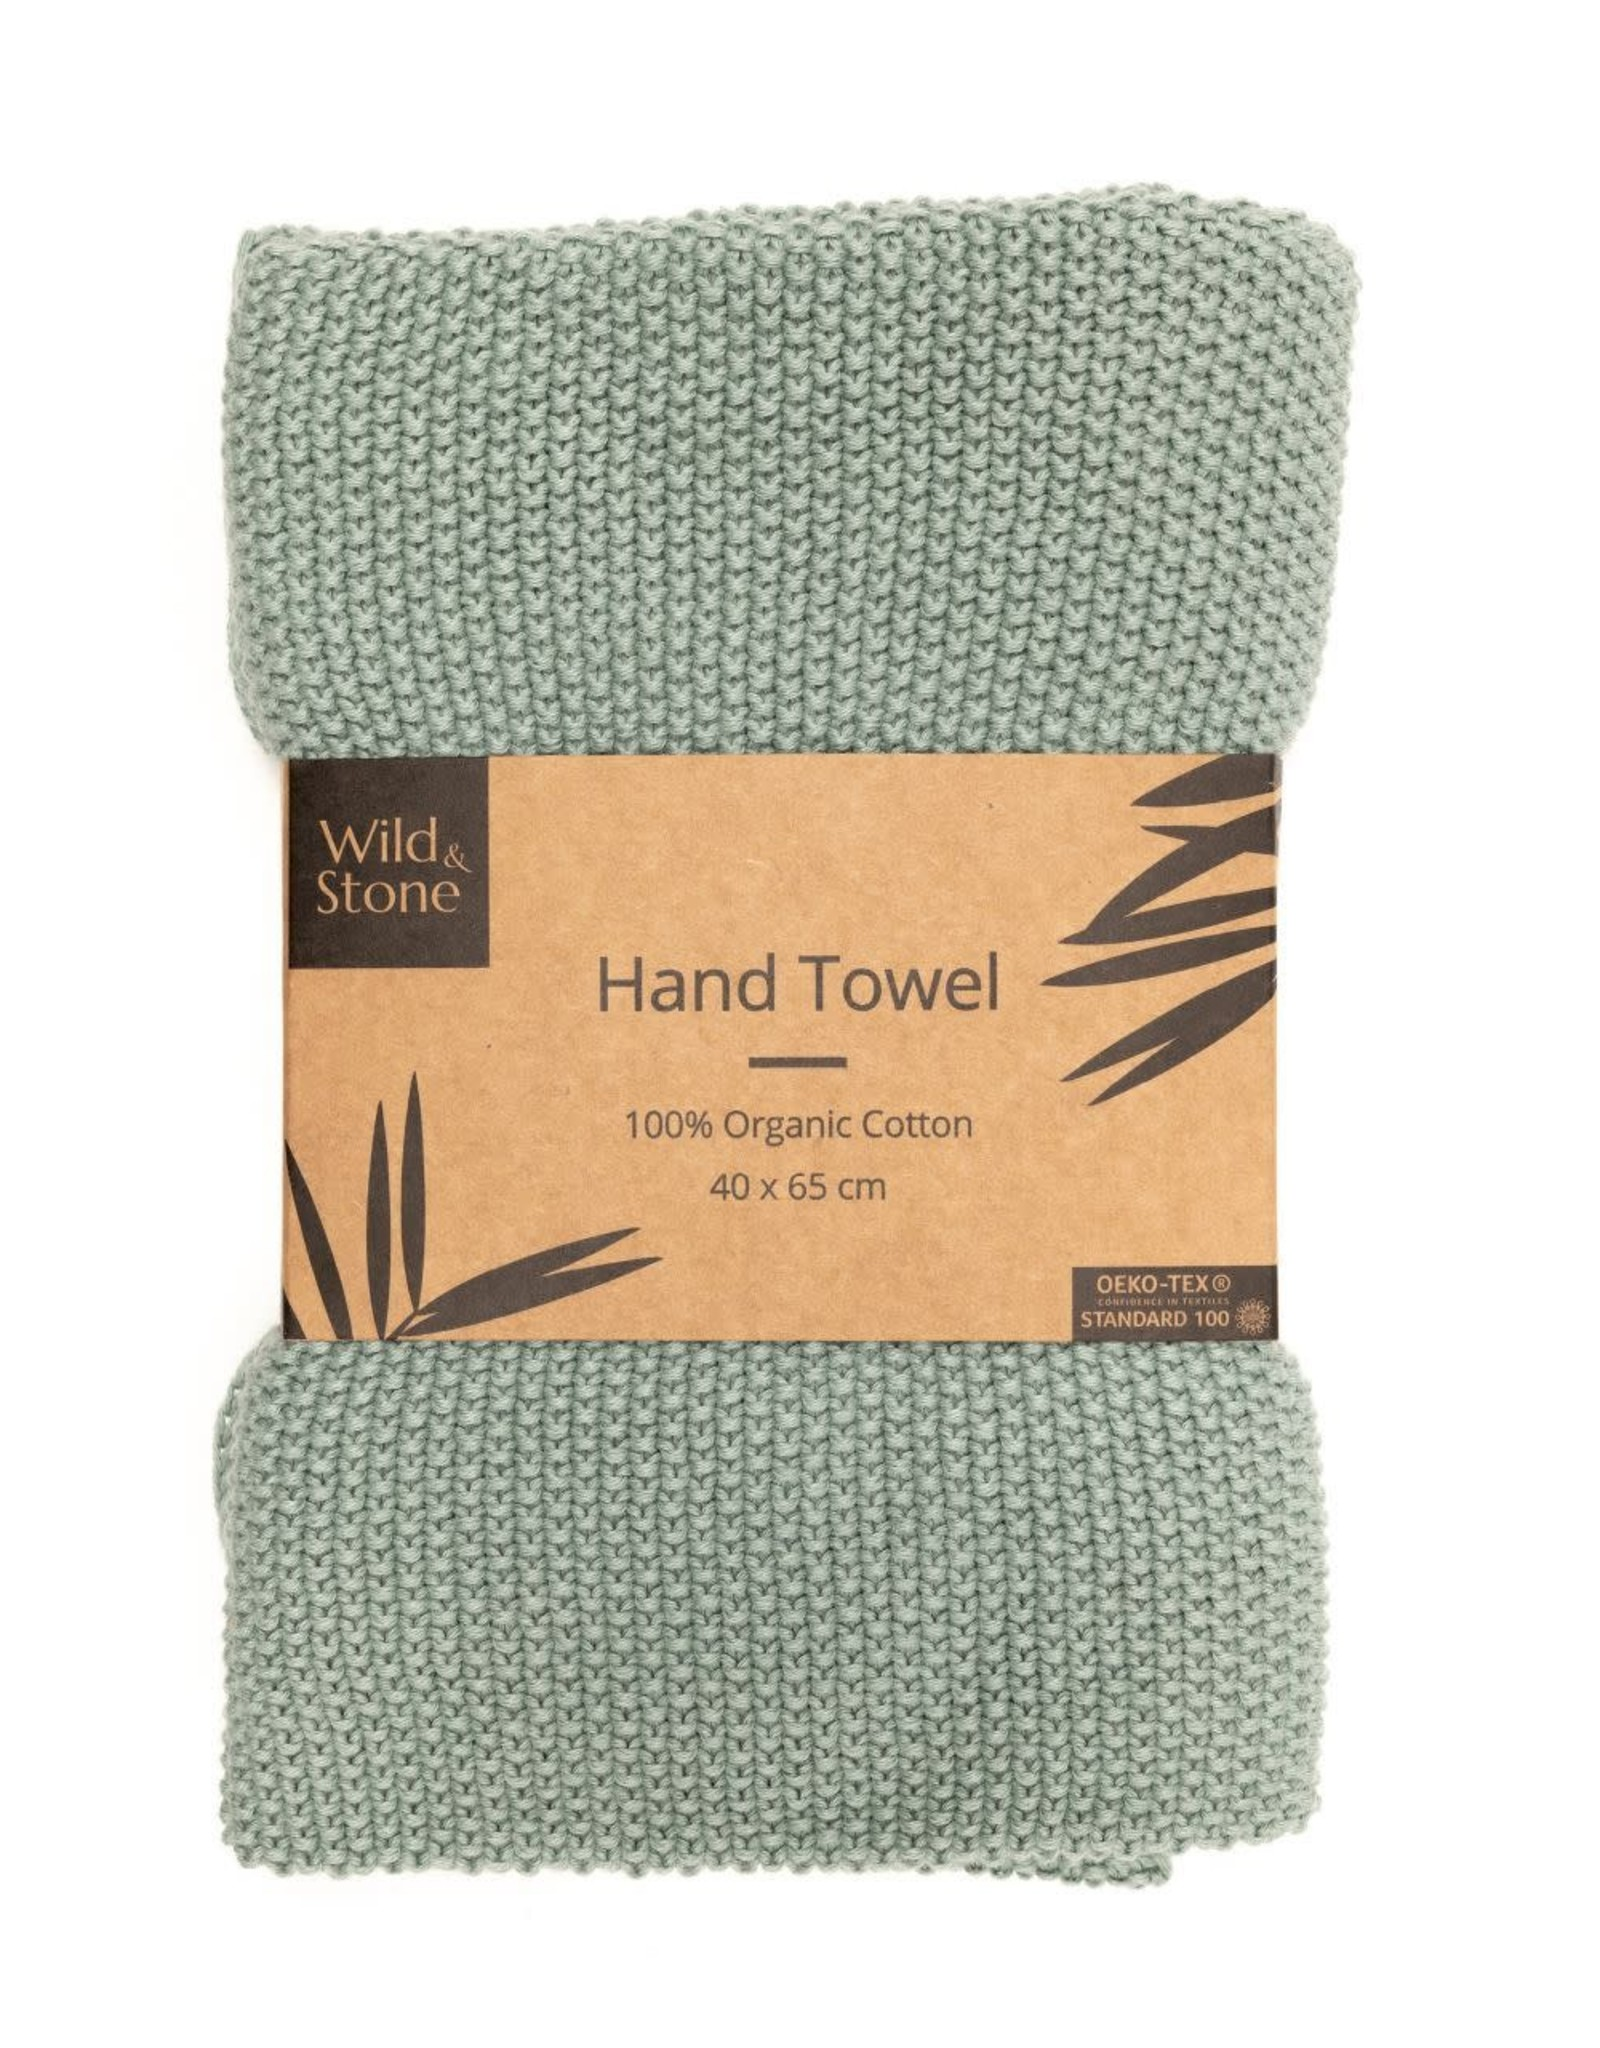 Wild & Stone Hand Towel Green